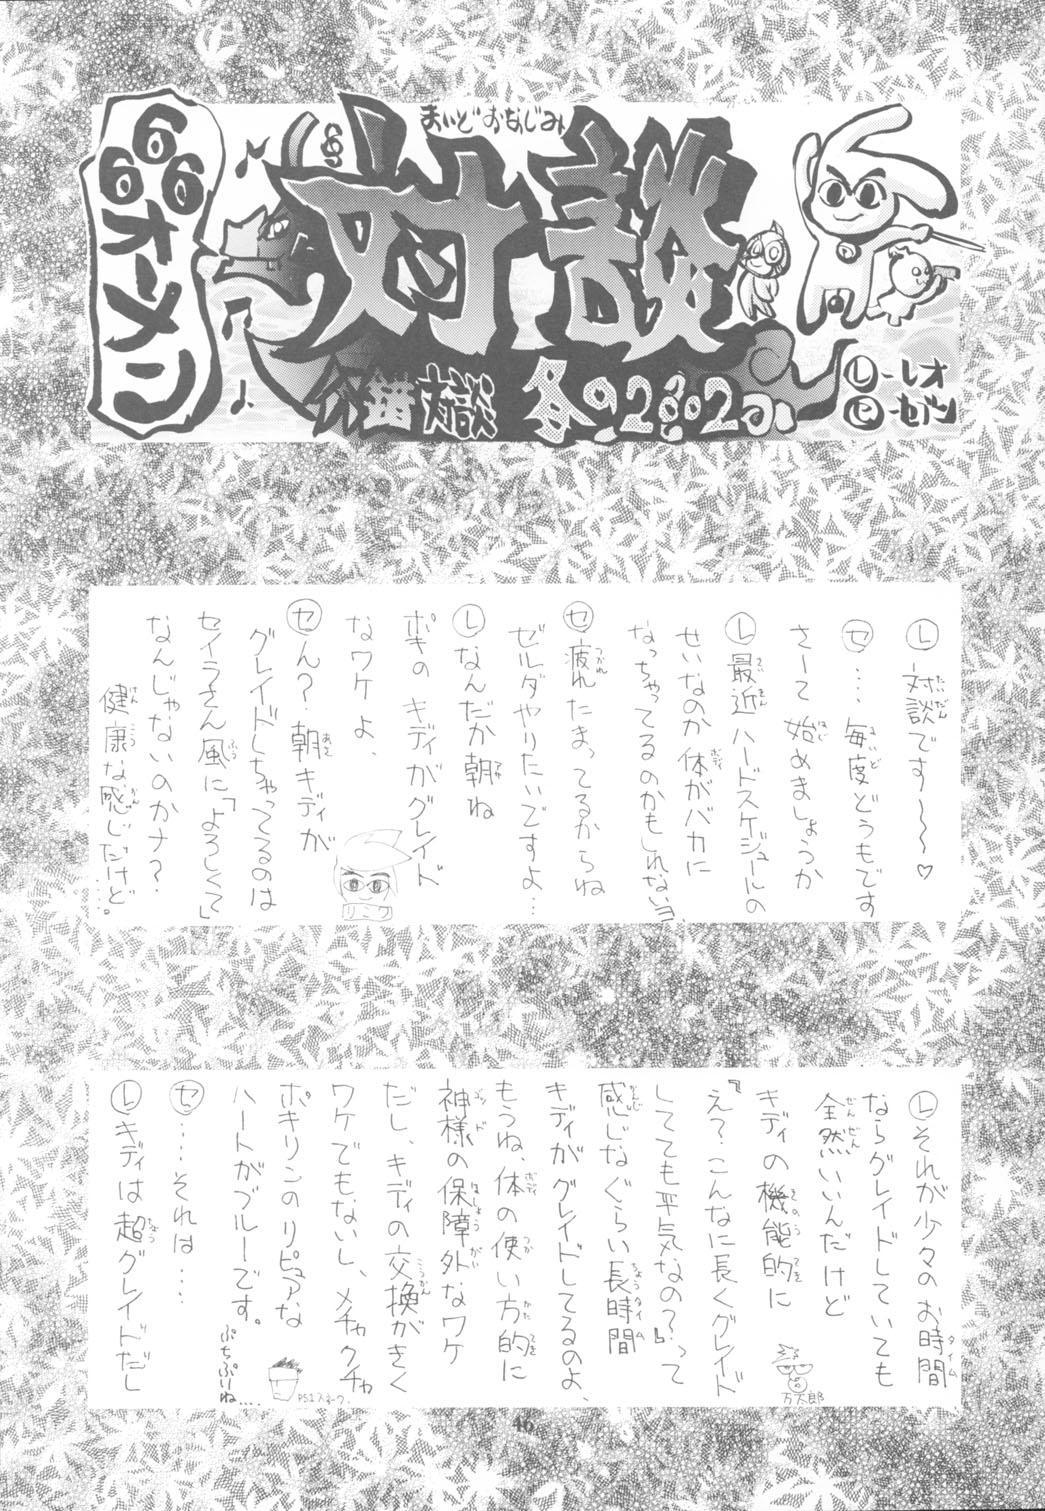 KAISHAKU RAGUNAROK ONLINE 45